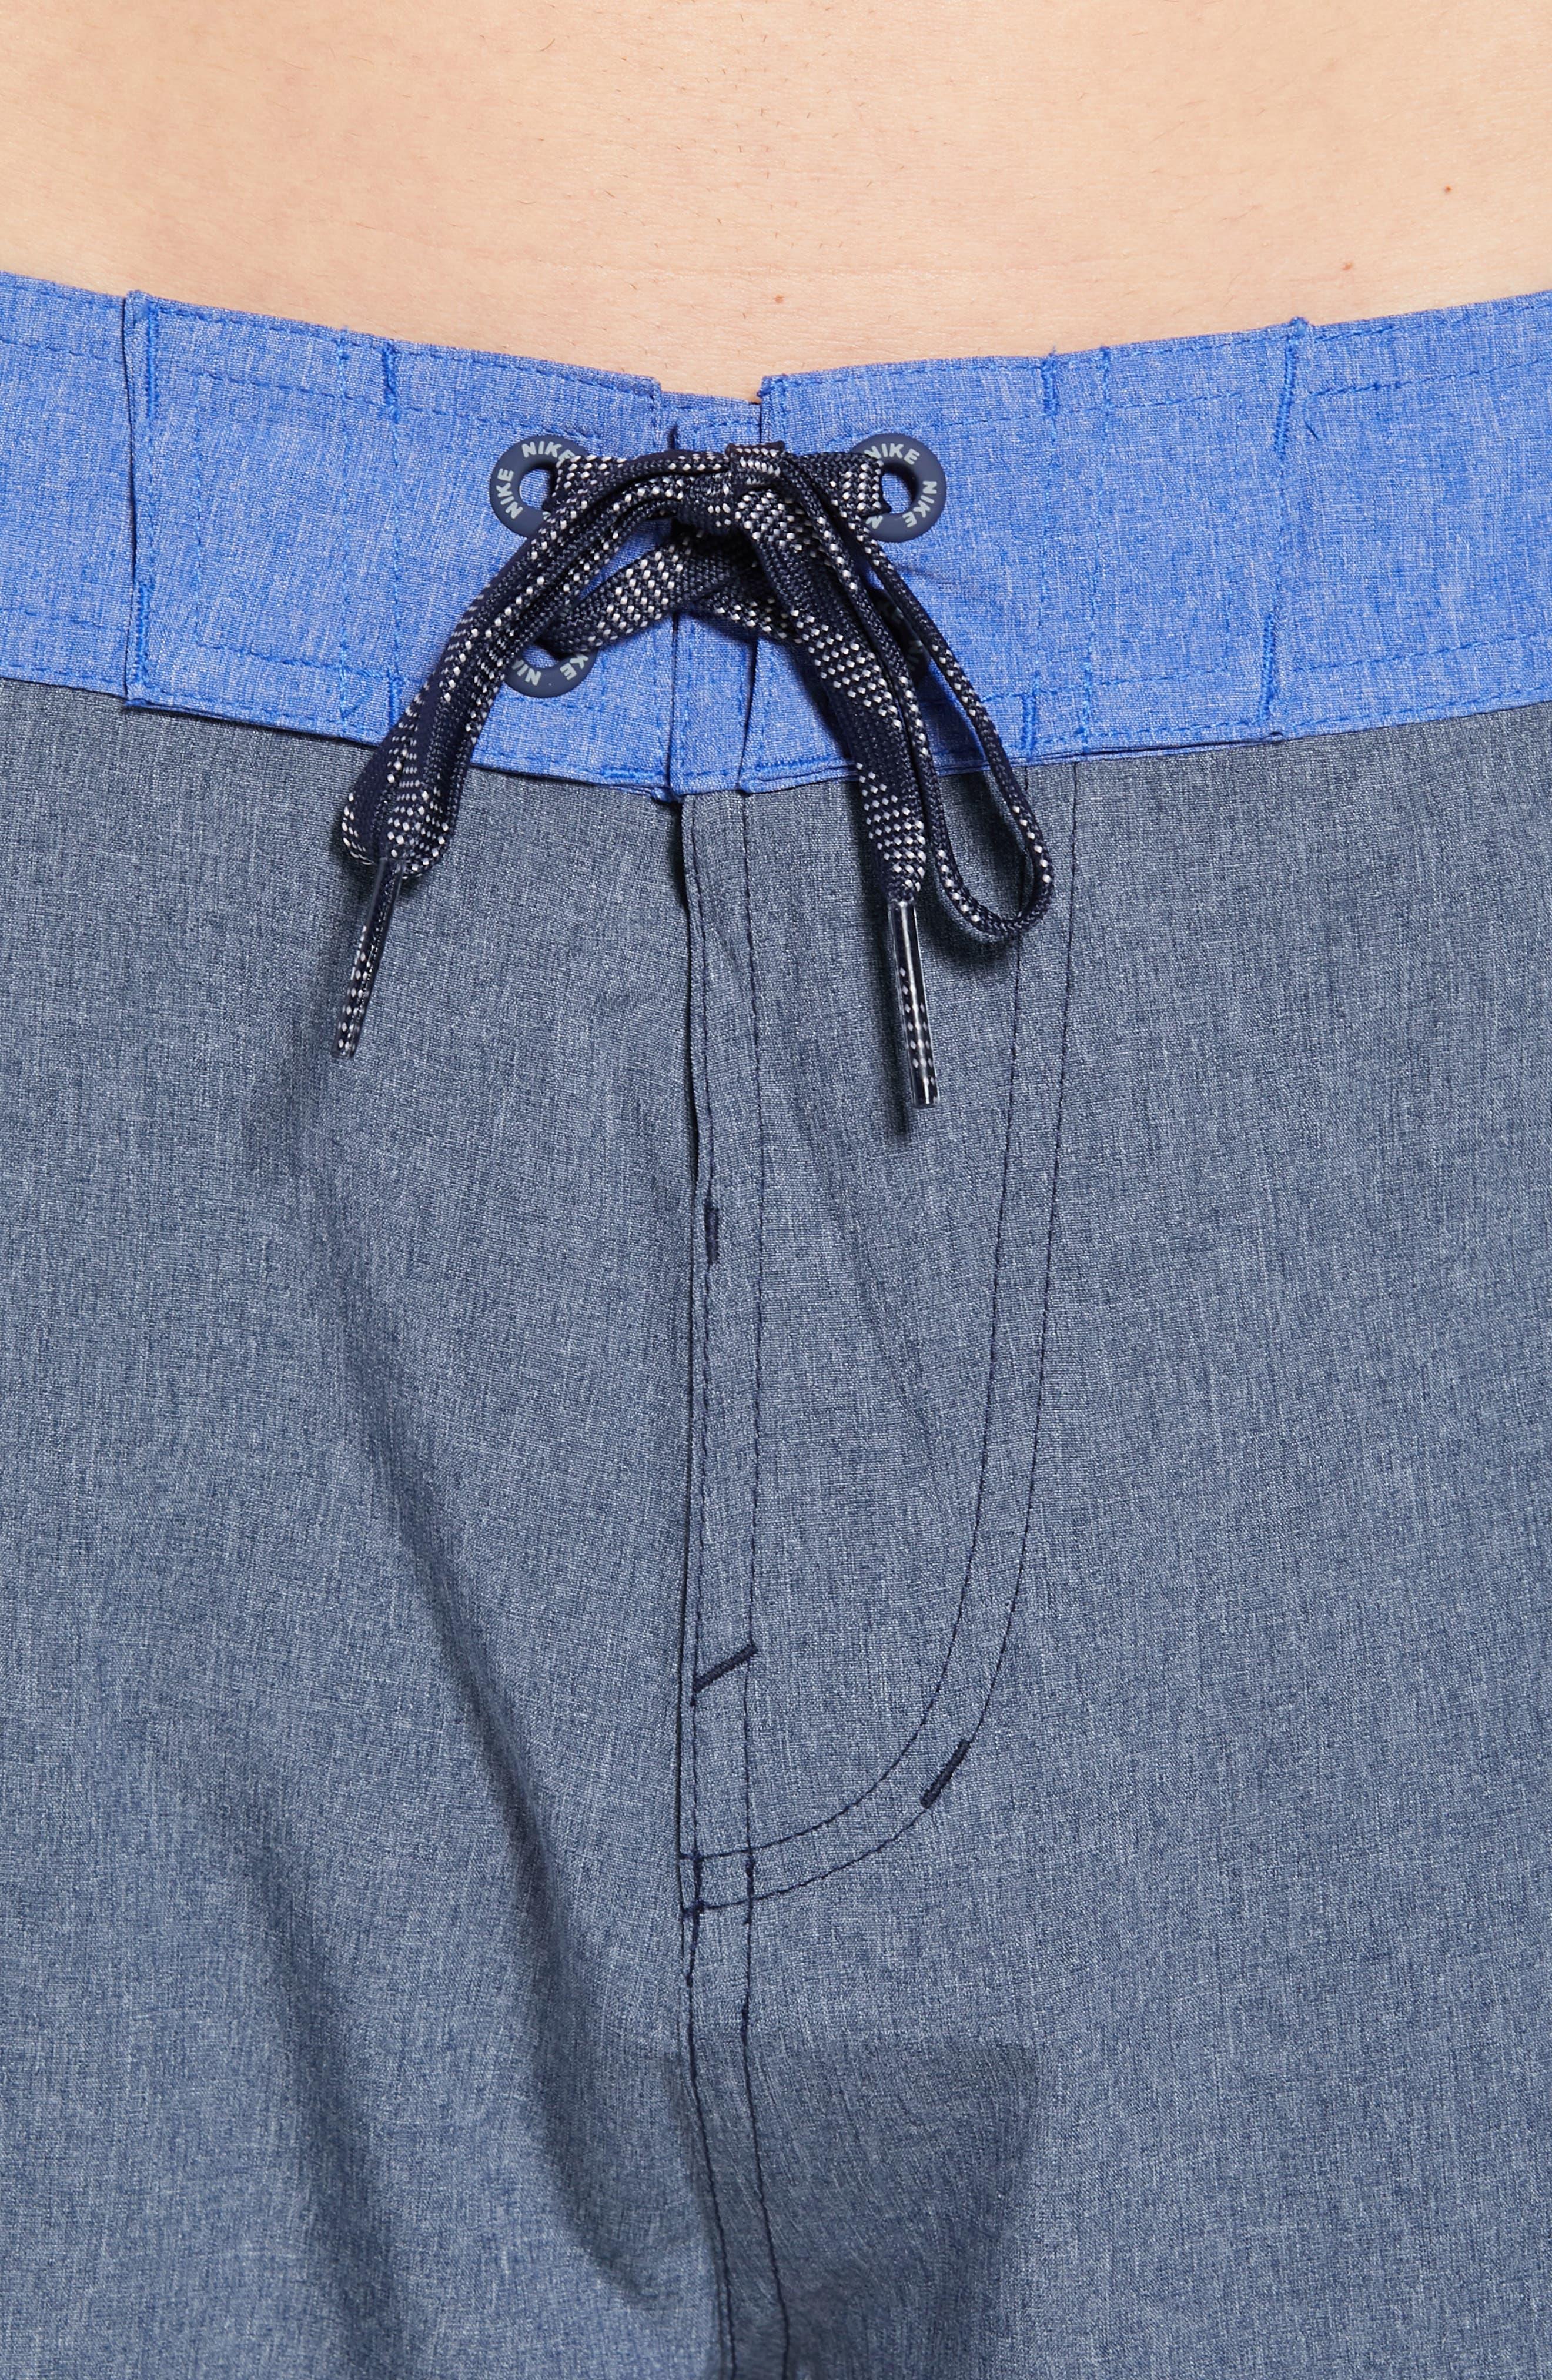 Vortex Board Shorts,                             Alternate thumbnail 5, color,                             Obsidian